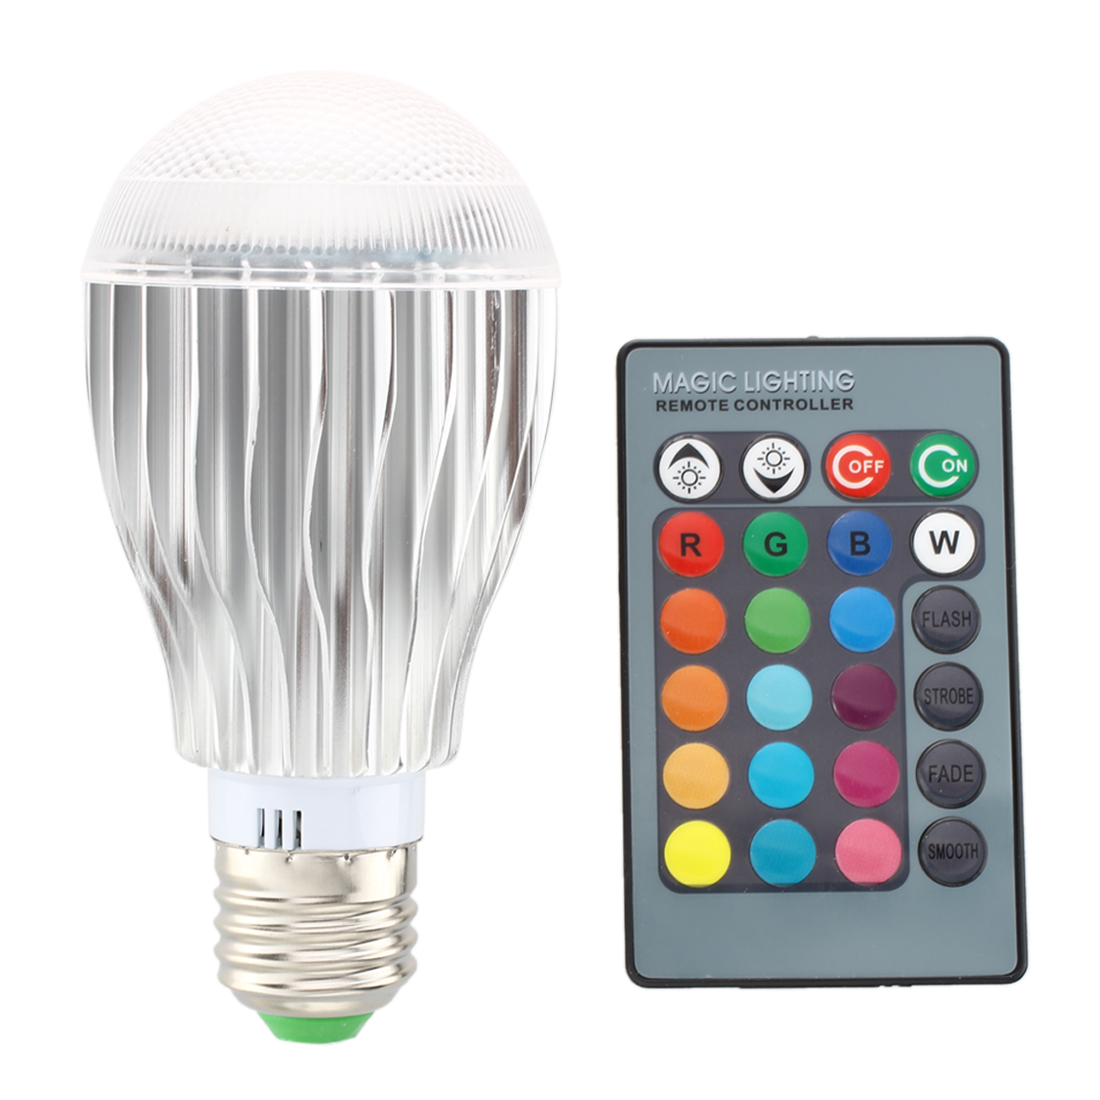 e27 9w rgb bunte led birne farbwechsel lampe licht 230v mit fernbedienung m9 ebay. Black Bedroom Furniture Sets. Home Design Ideas